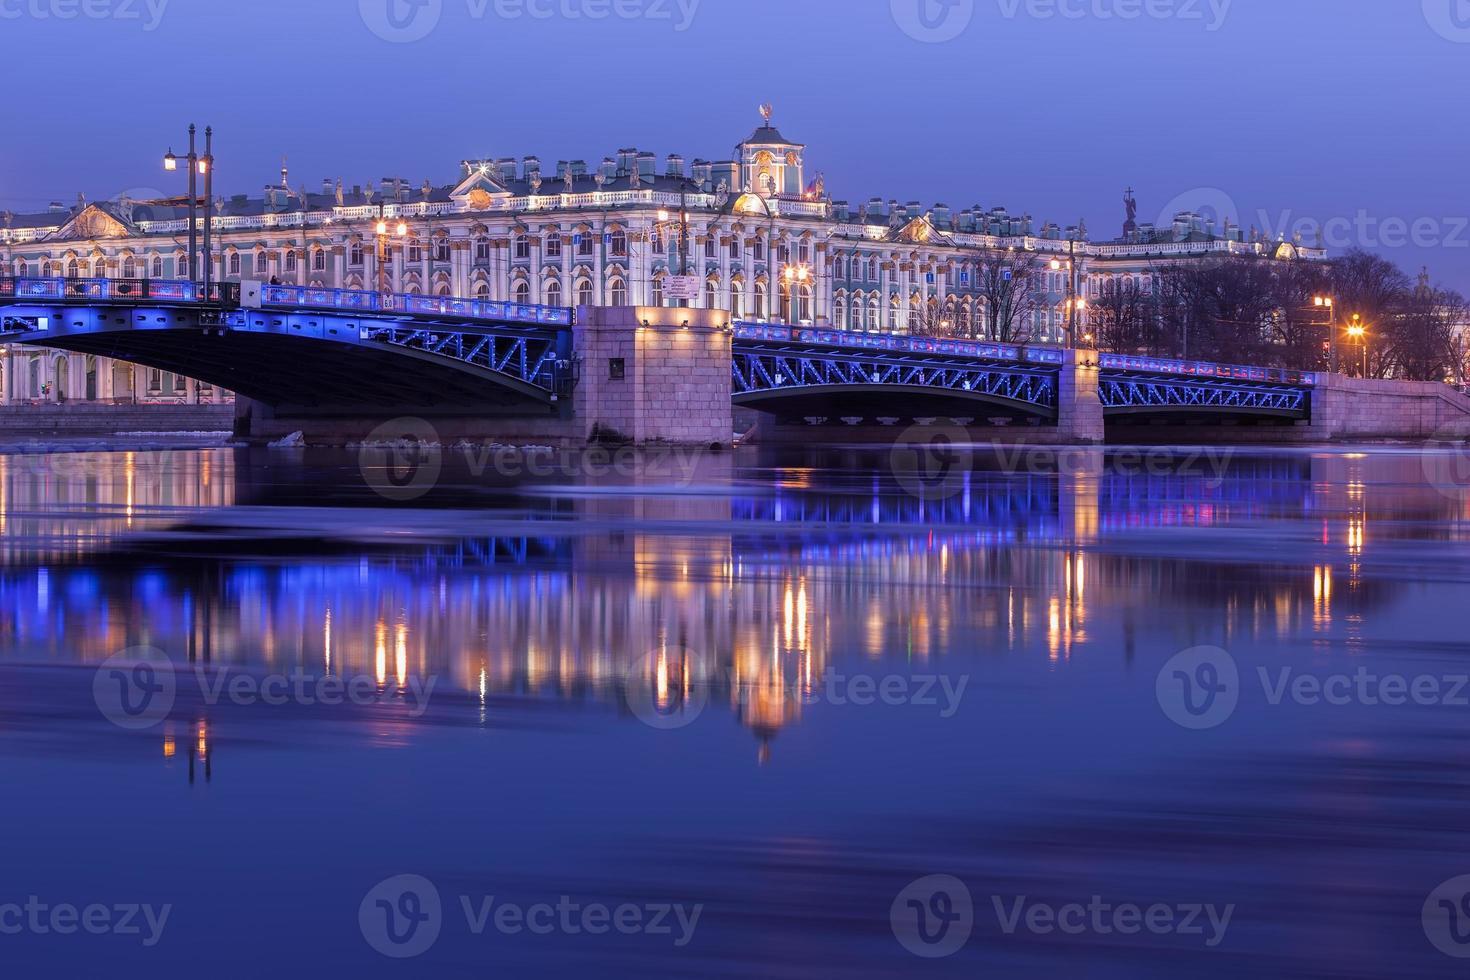 Palace Bridge and Hermitage at night, St. Petersburg photo